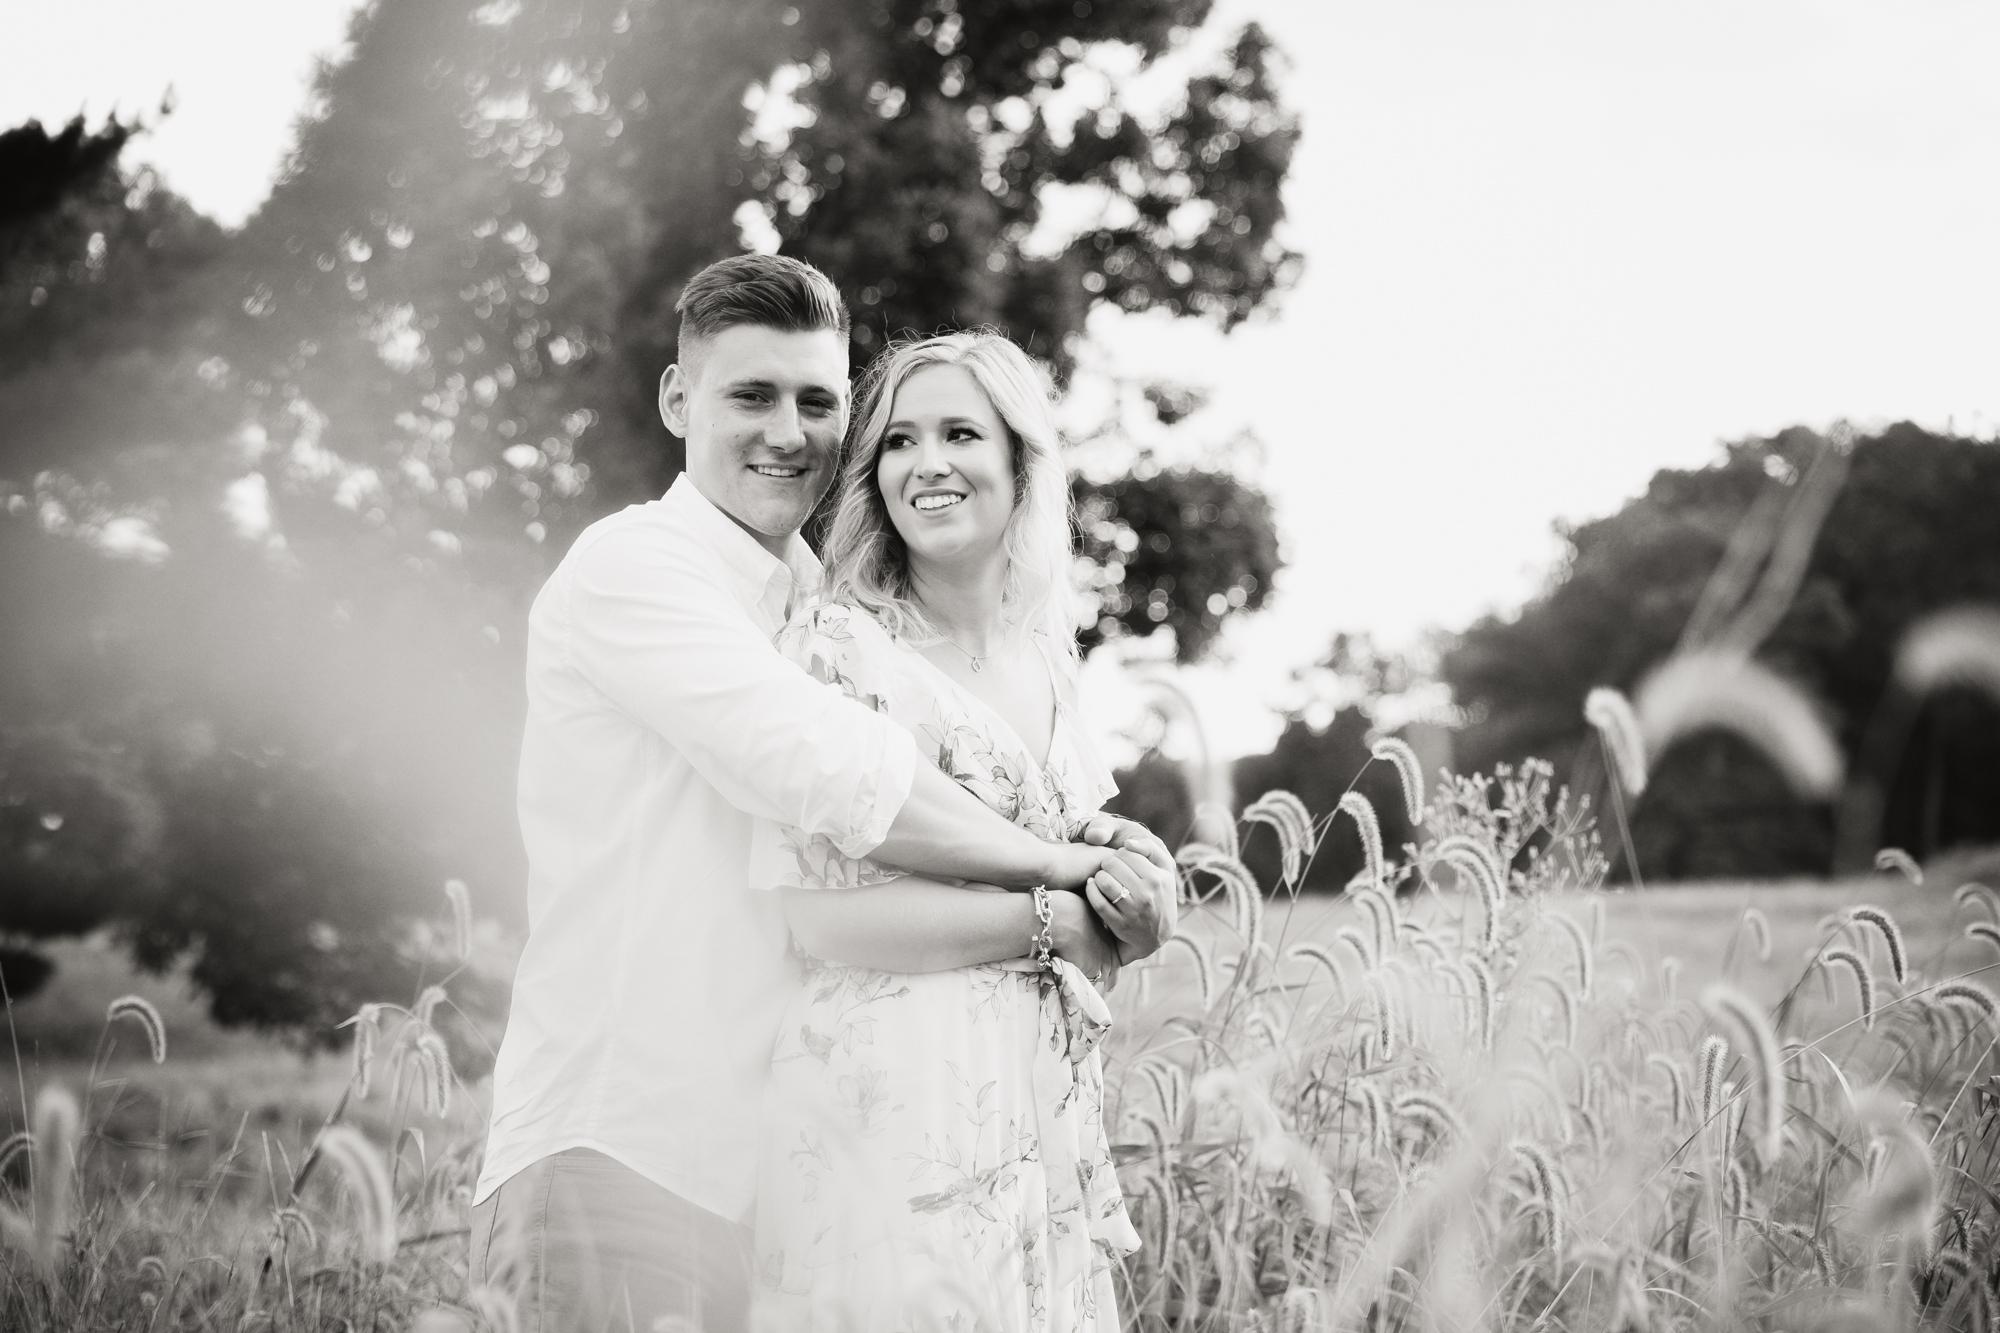 Amanda and Chris - Engagmenet Photos - Valley Forge Park - 033.jpg